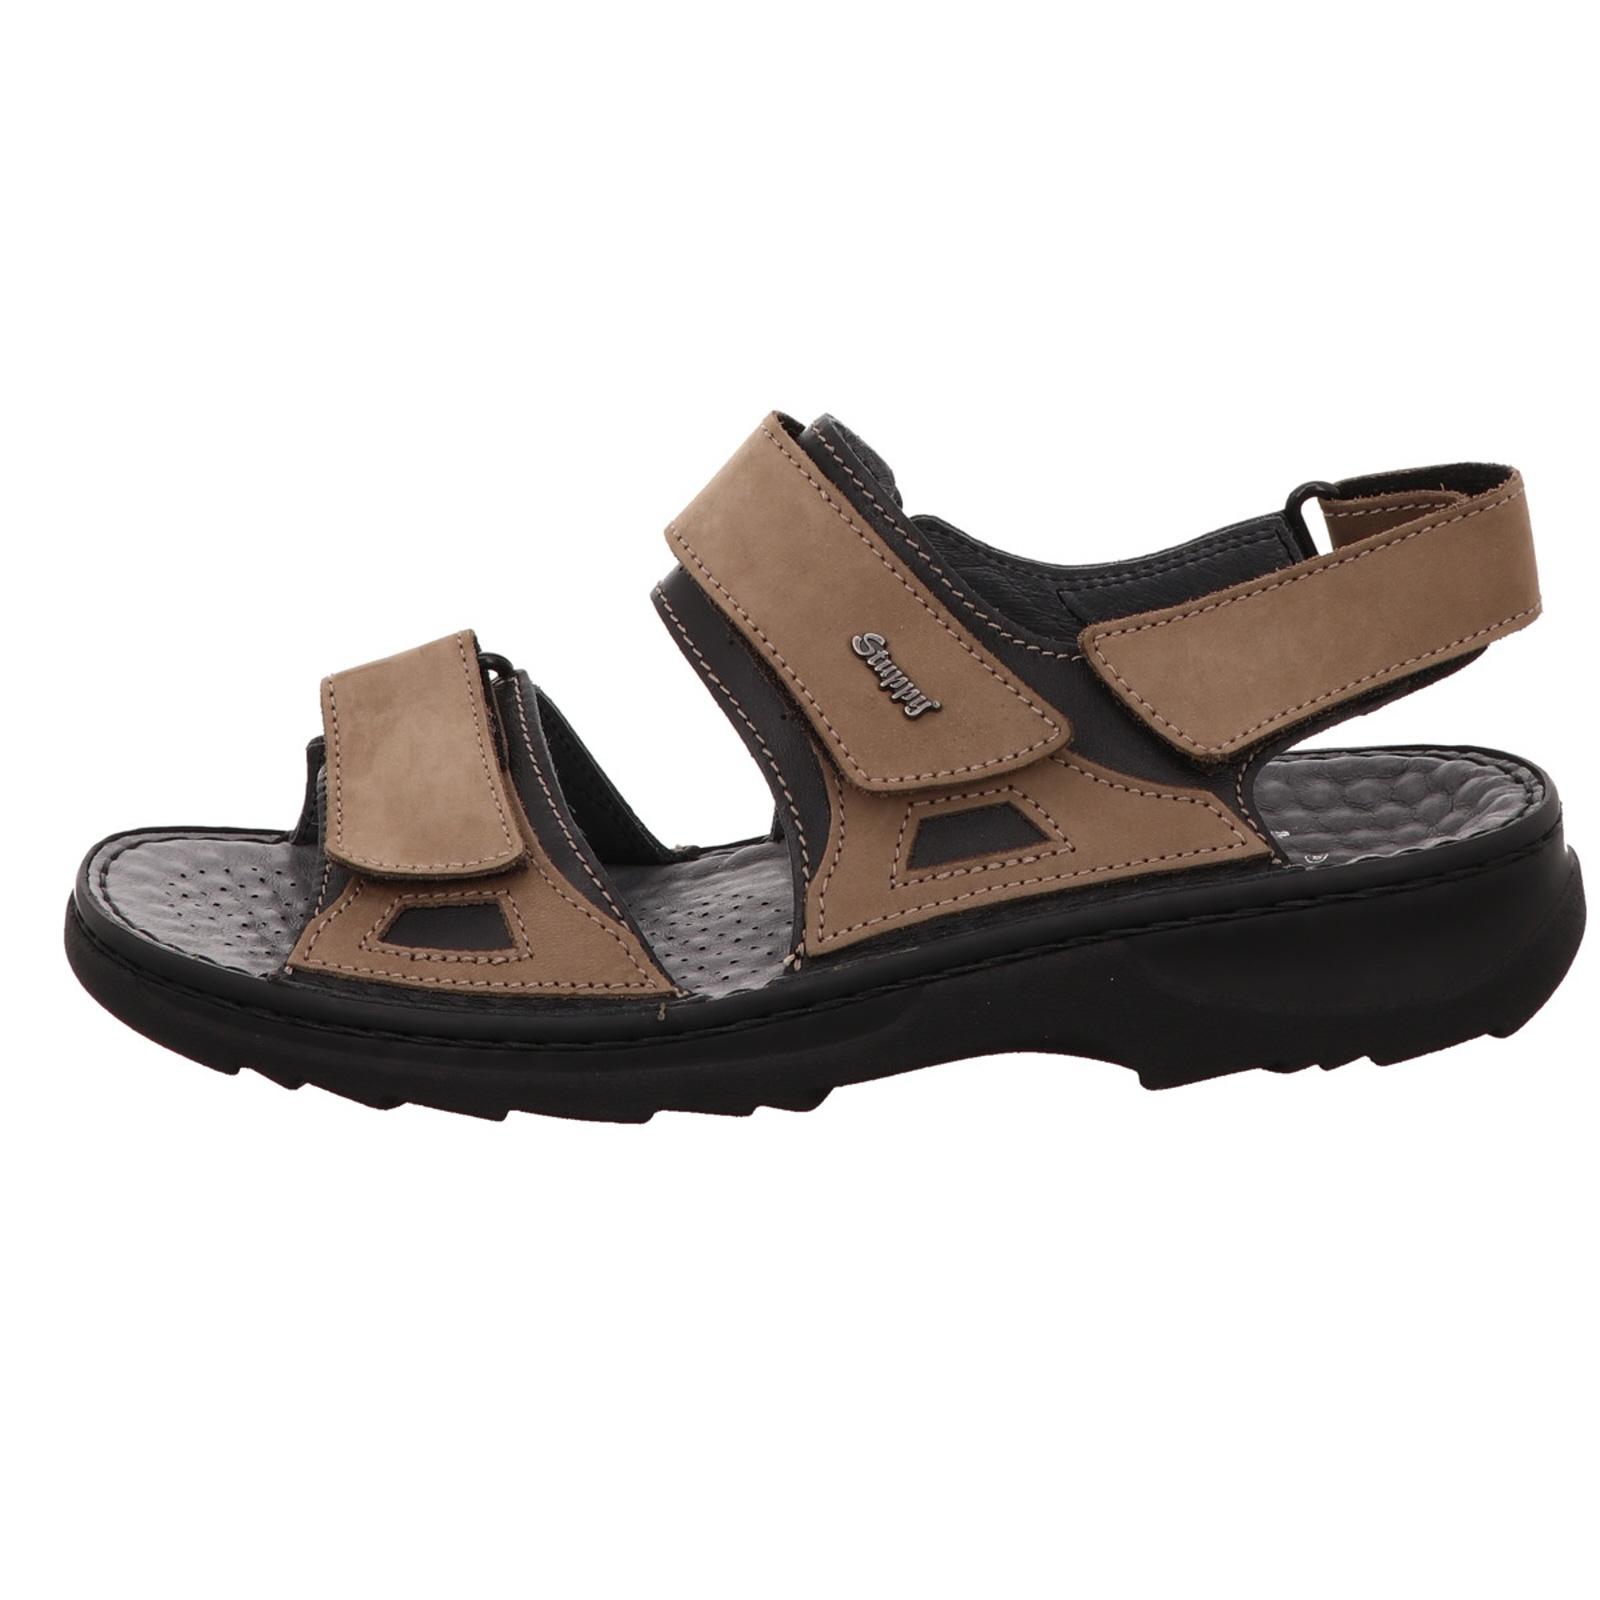 Zapatos de mujer baratos zapatos de mujer Nuovo scarpe da uomo sandalo Ermanno Scervino made in Italy in vera pelle 40